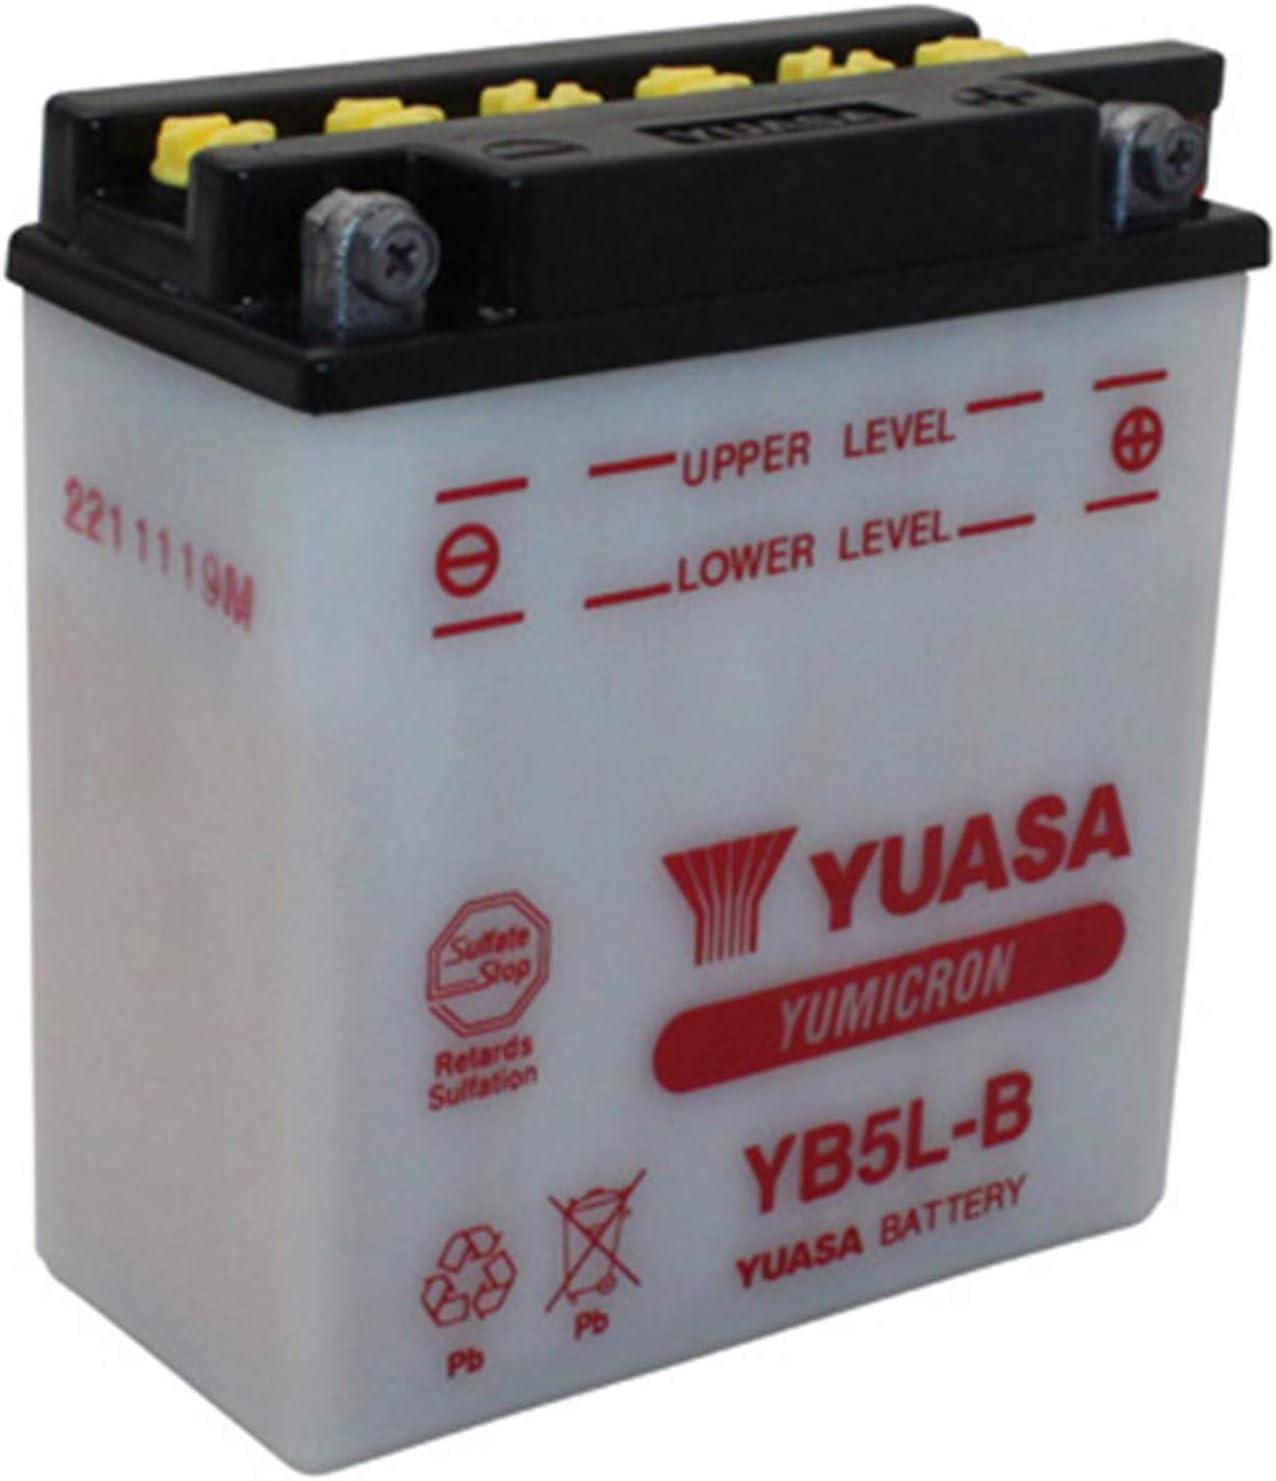 Yuasa Batterie Yb5l B Offen Ohne Saeure Auto